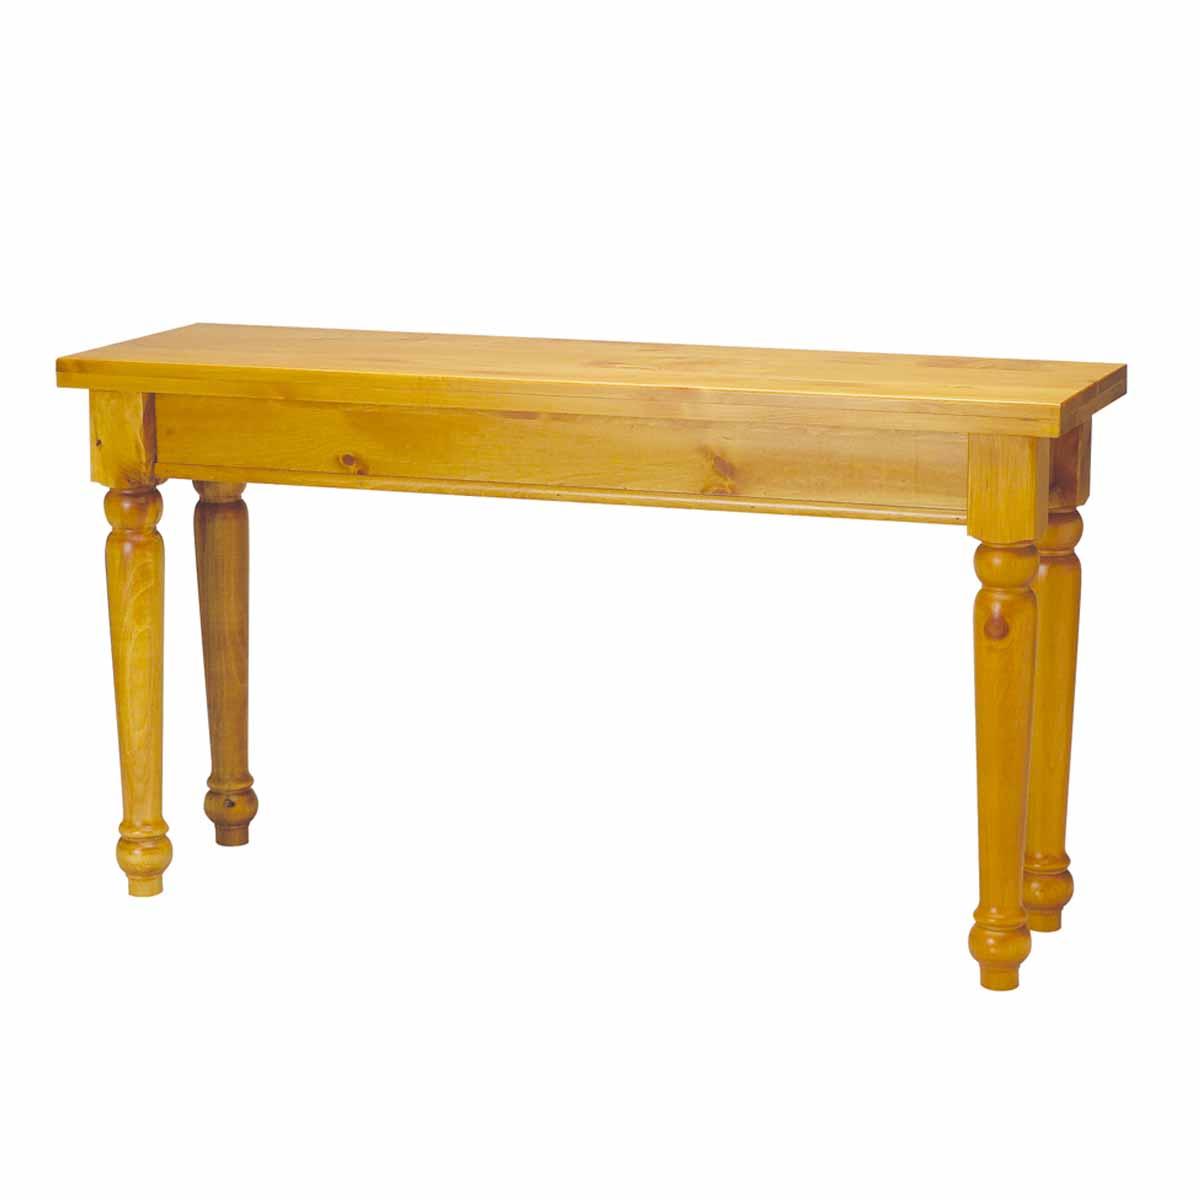 Sofa Table Heirloom Pine Wentworth 28 H X 52 W